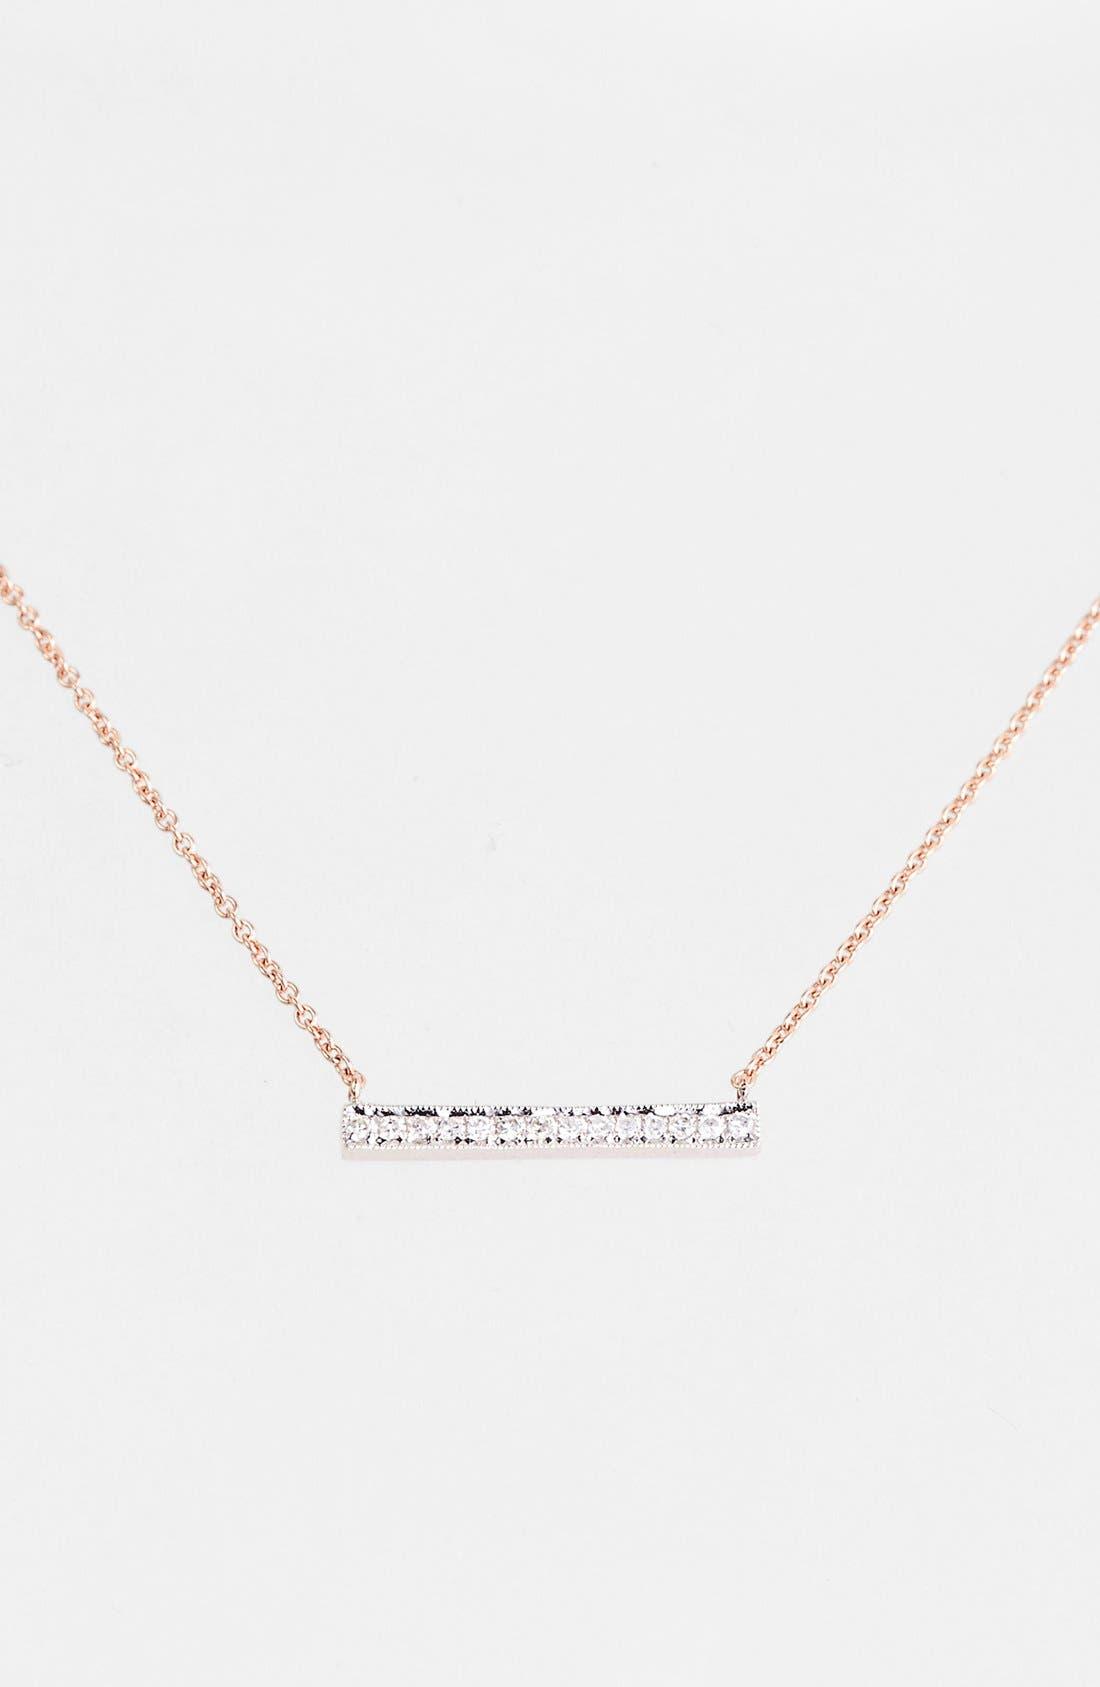 DANA REBECCA DESIGNS Sylvie Rose Medium Diamond Bar Pendant Necklace